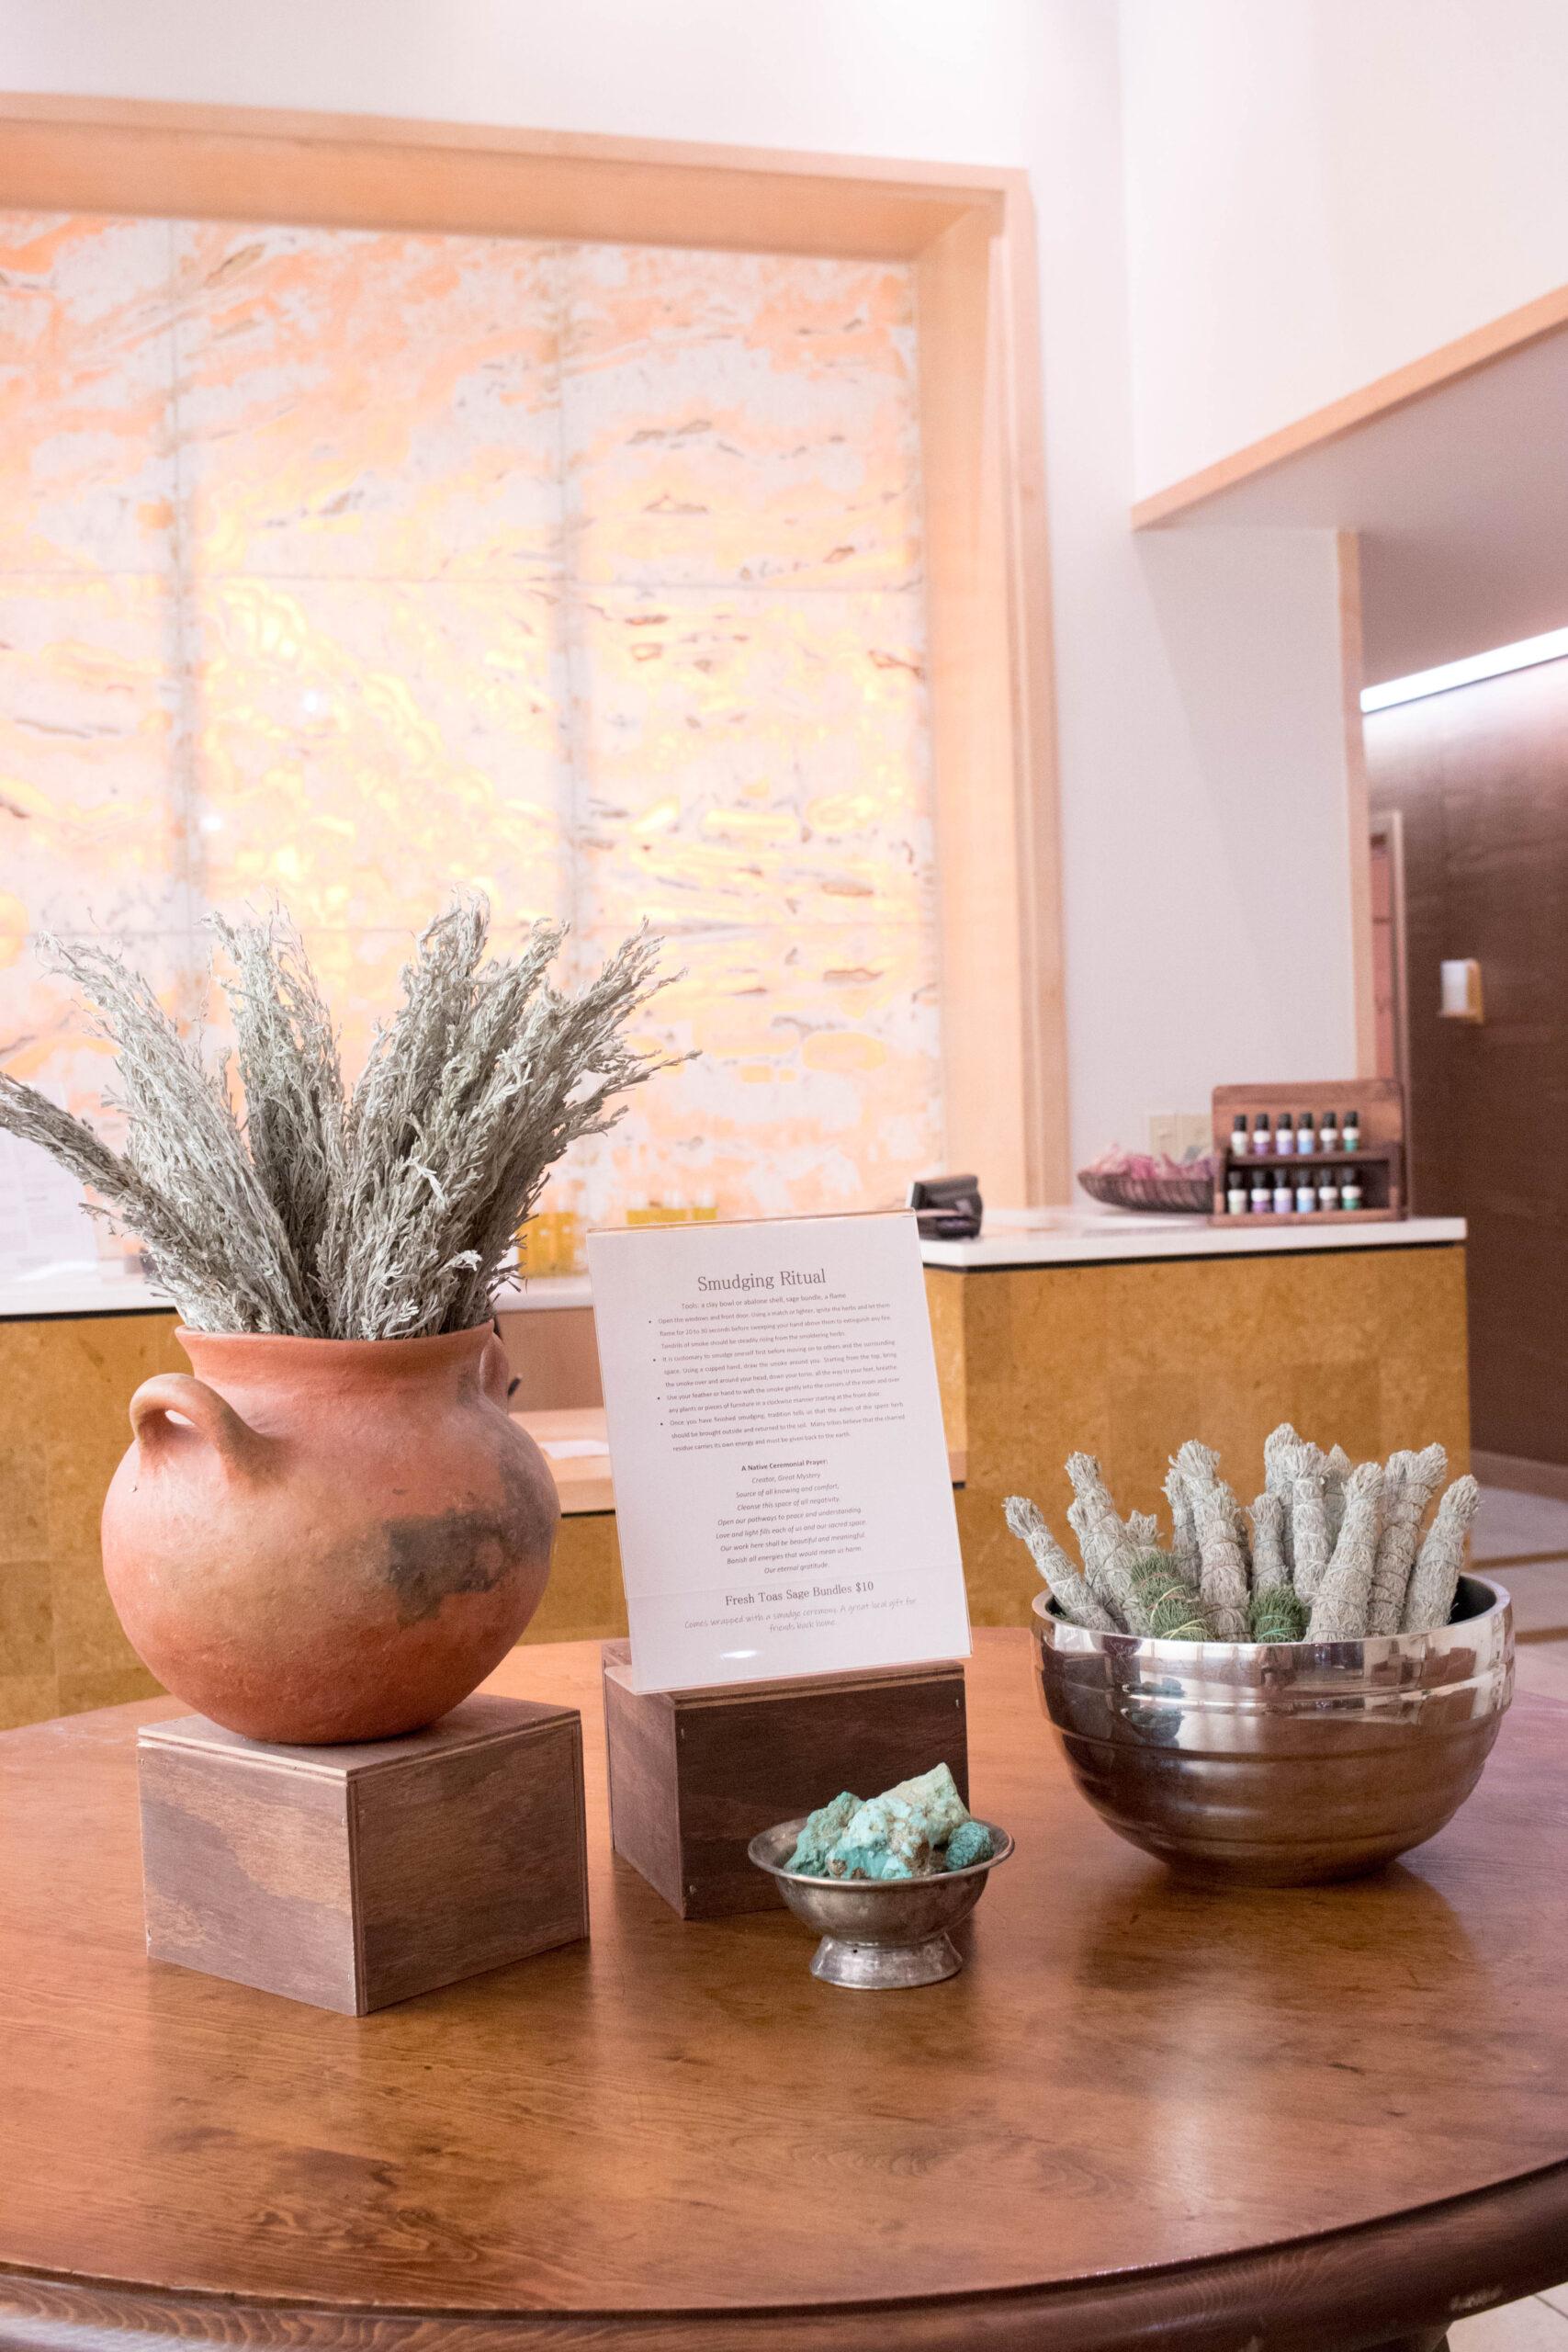 Nidah spa Eldorado hotel Santa Fe #spa #spatreatment #santafe